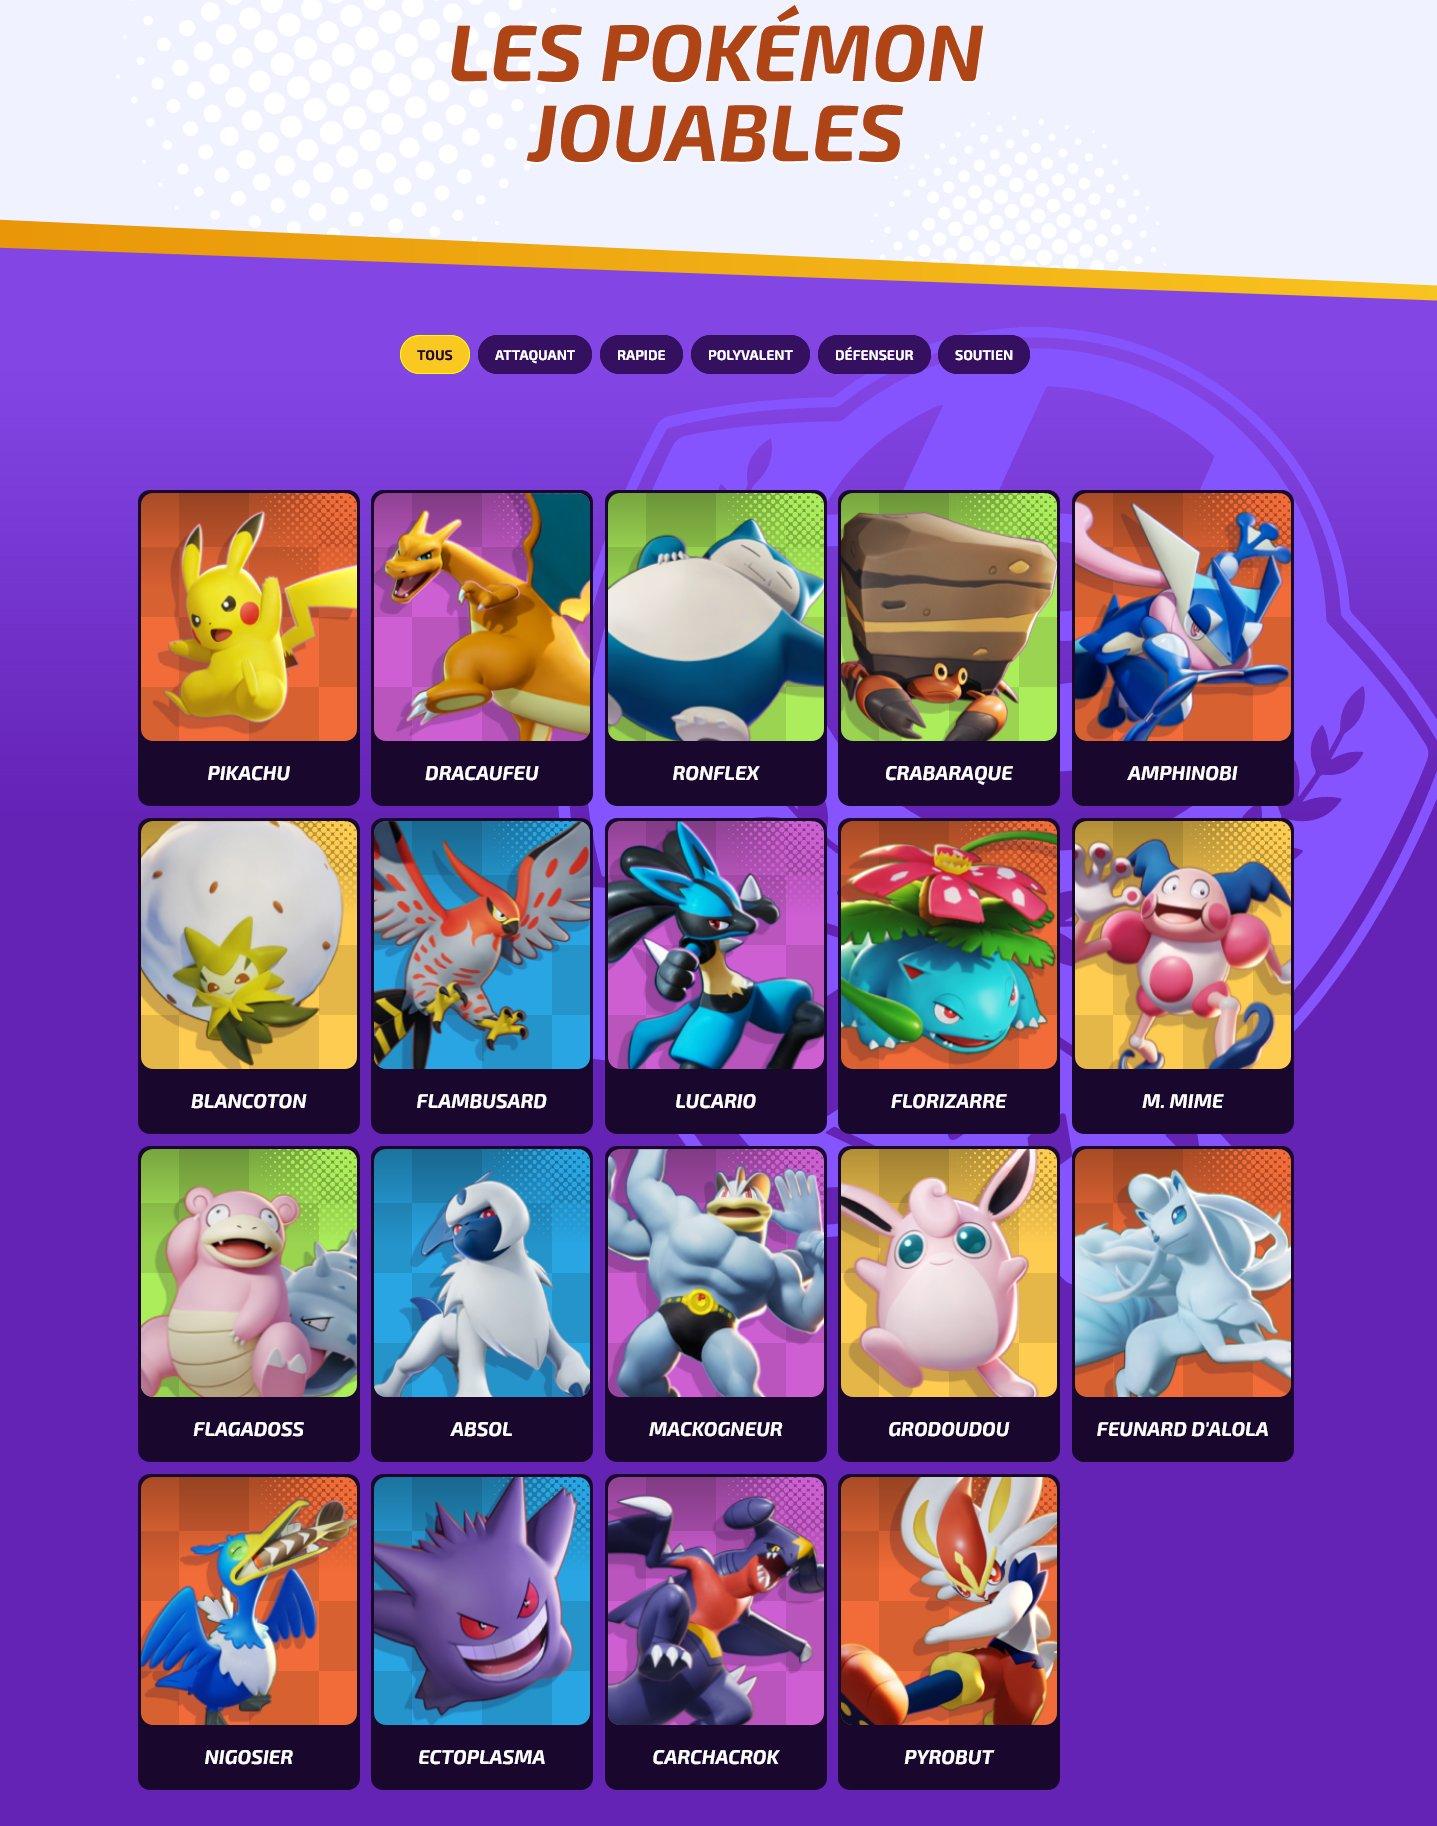 pokémon-unite-pokémon-jouables